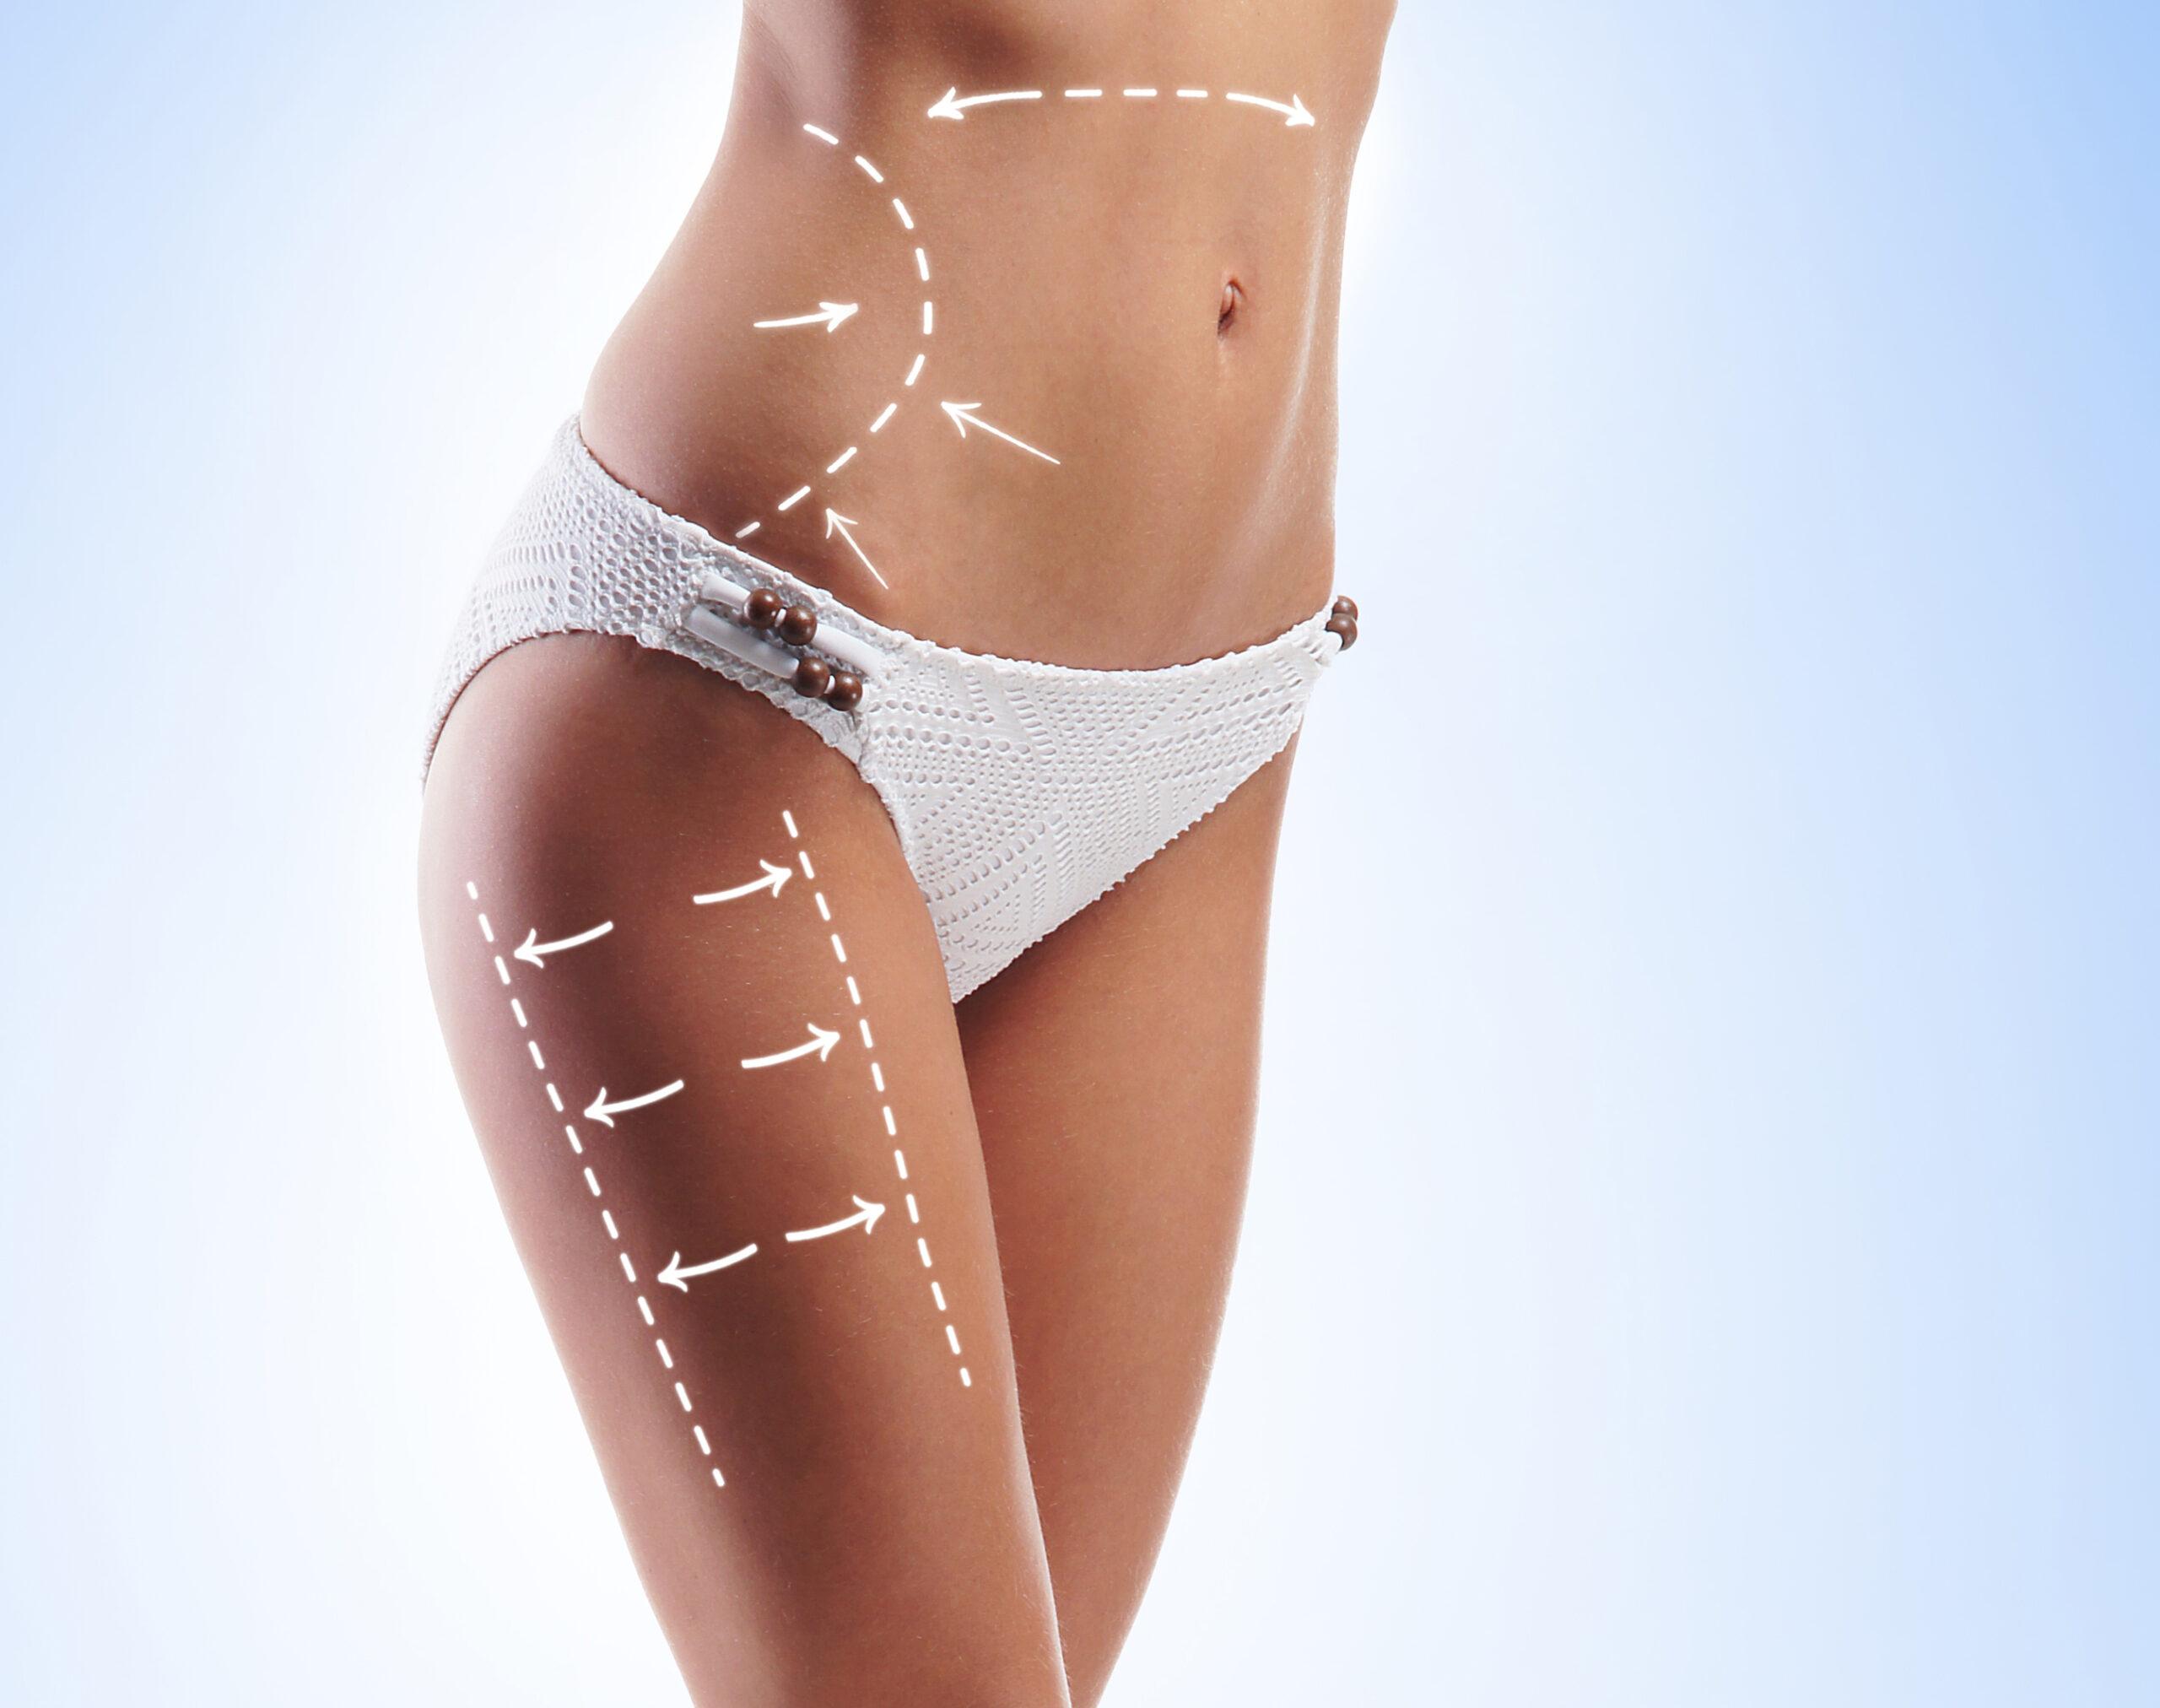 Aesthetica Liposuction